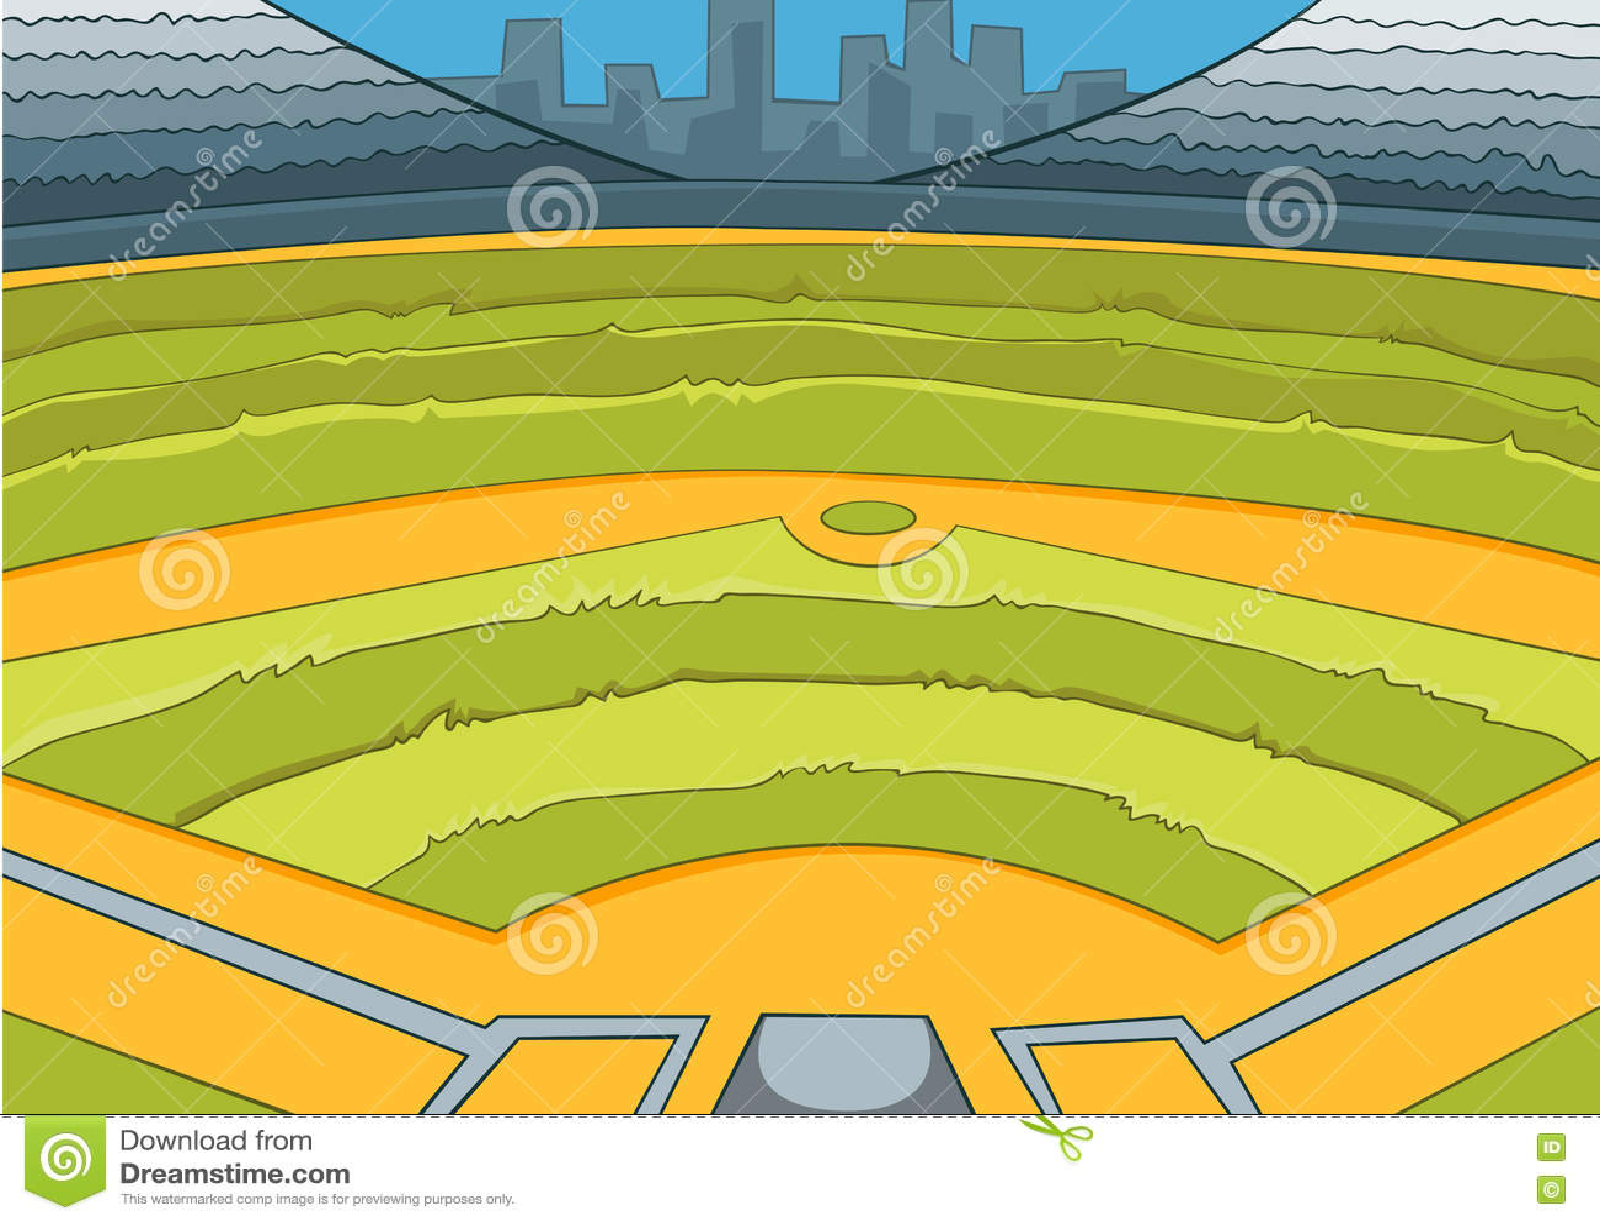 cartoon background of baseball stadium stock illustration rh dreamstime com cartoon baseball field clip art cartoon baseball field images